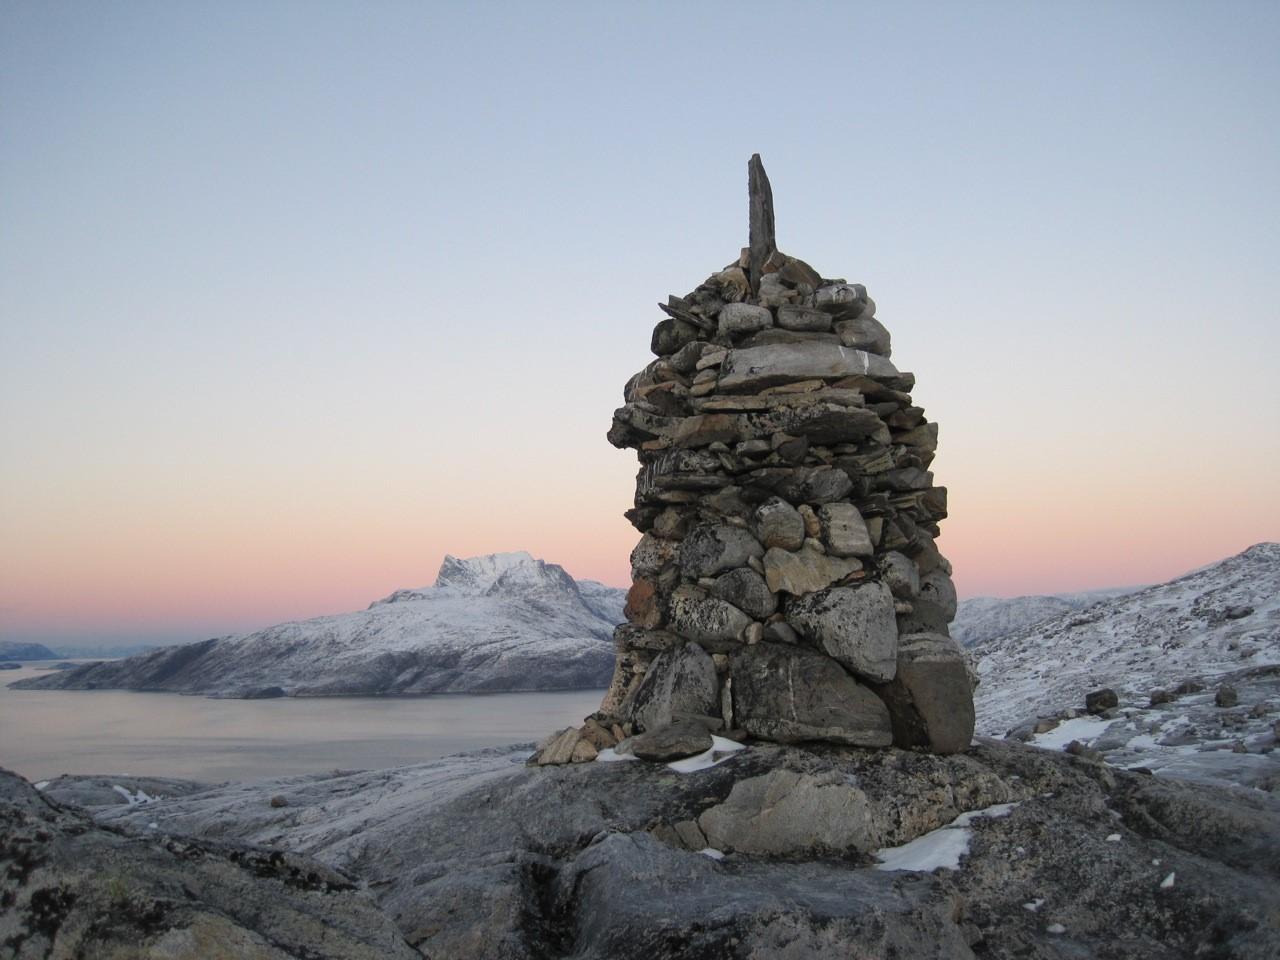 Inussuk - Pejling mod Grønland - Inussuk - Pejling mod Grønland